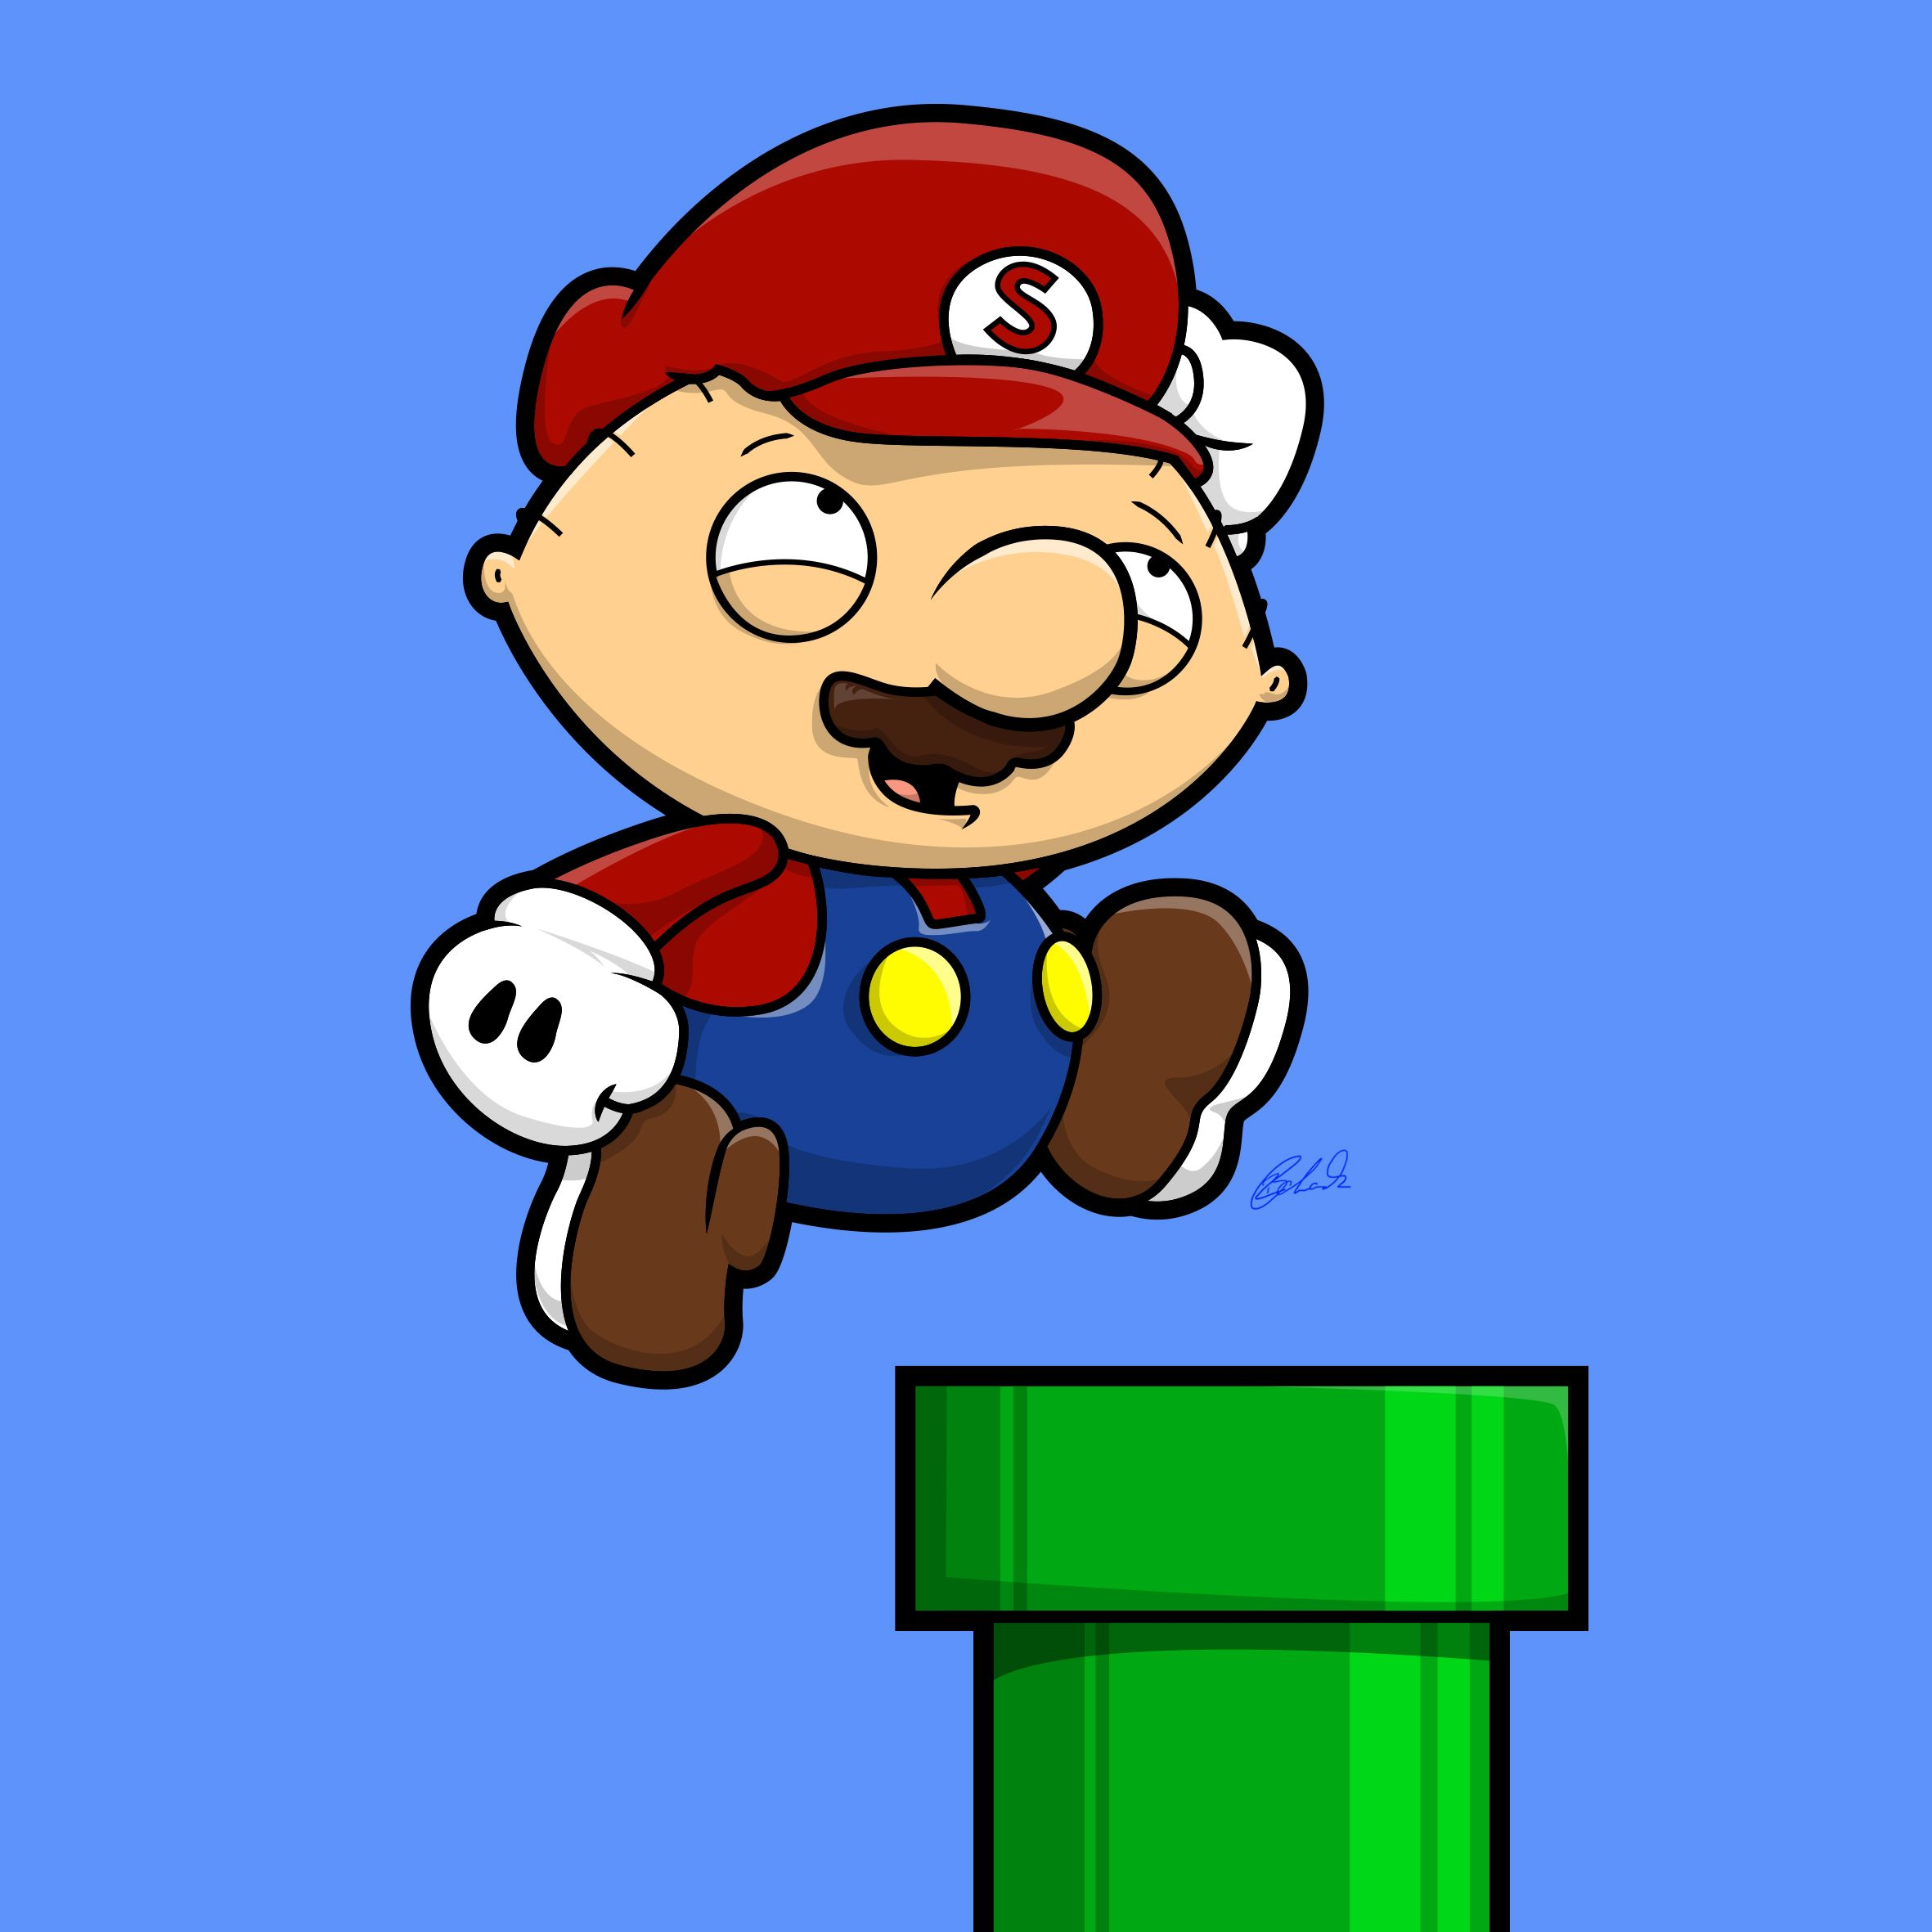 Super Mario Griffin Vector illustration, Illustration, Mario